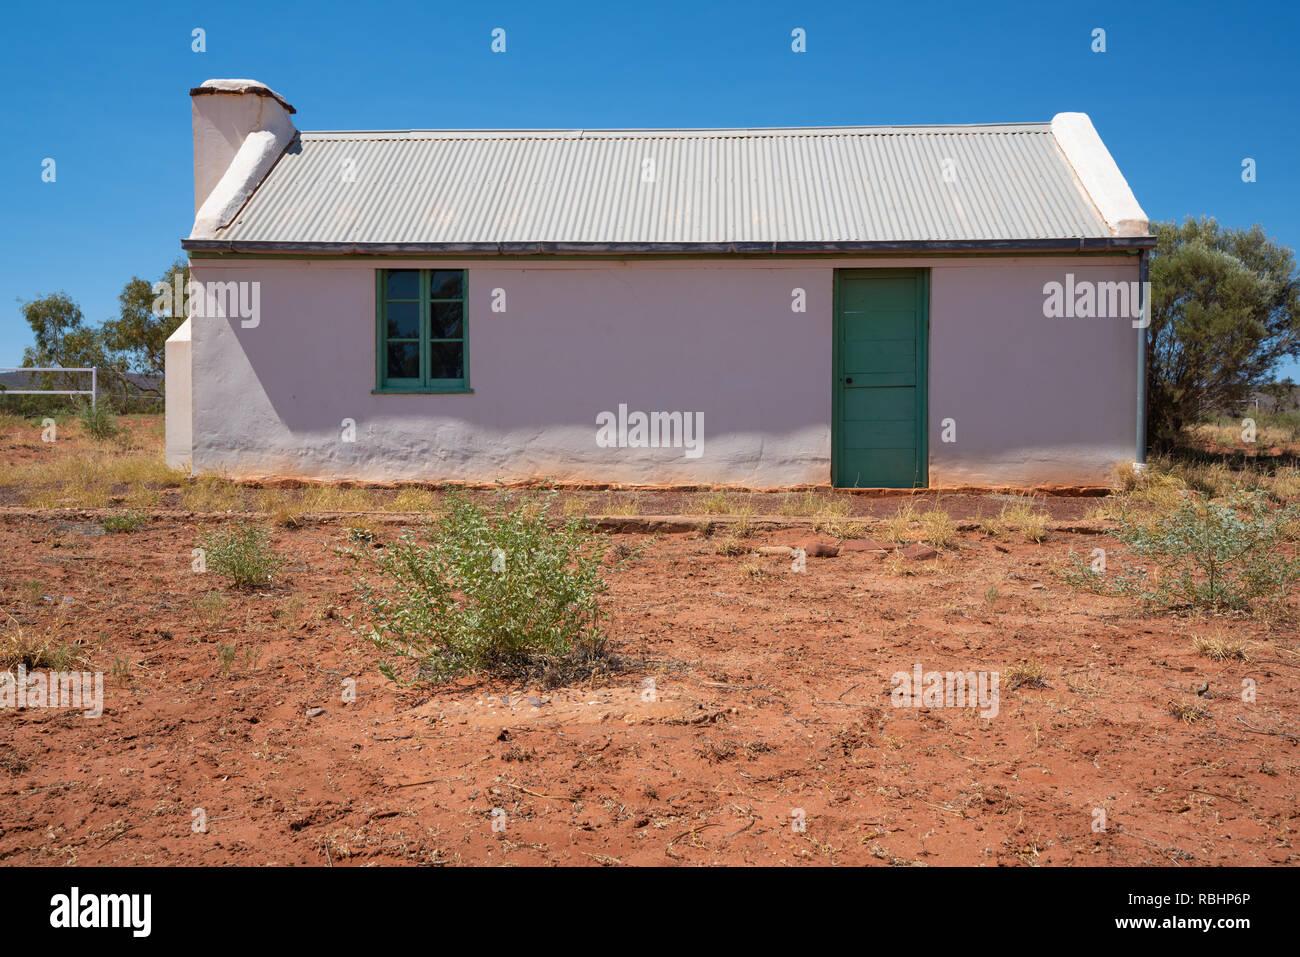 First house now abandoned of Australian indigenous artist Albert Namatjira in MacDonnell ranges Northern Territory Australia - Stock Image